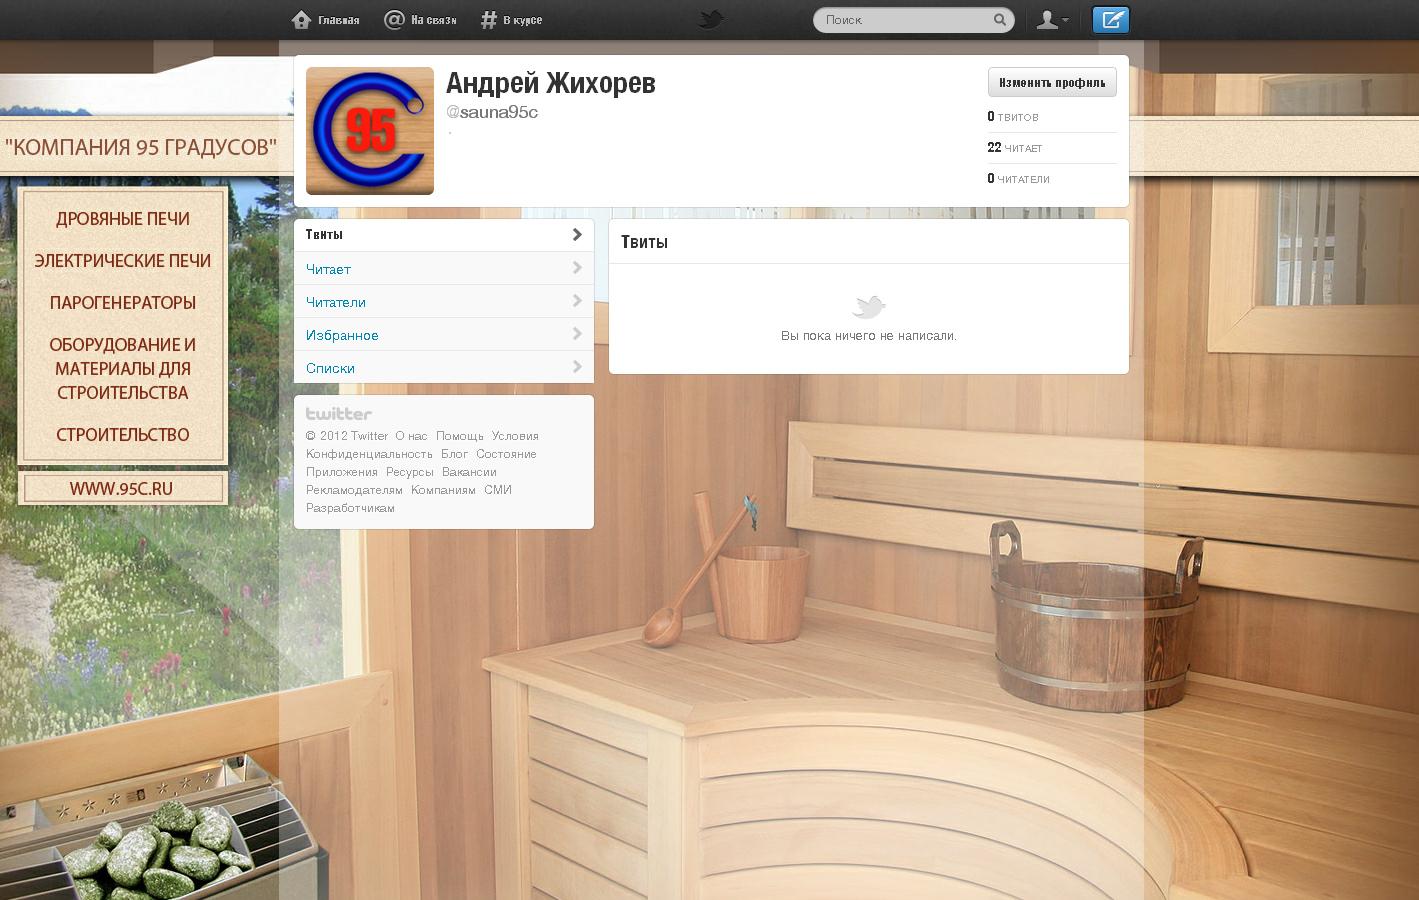 Дизайн страницы Twitter 95C Бани